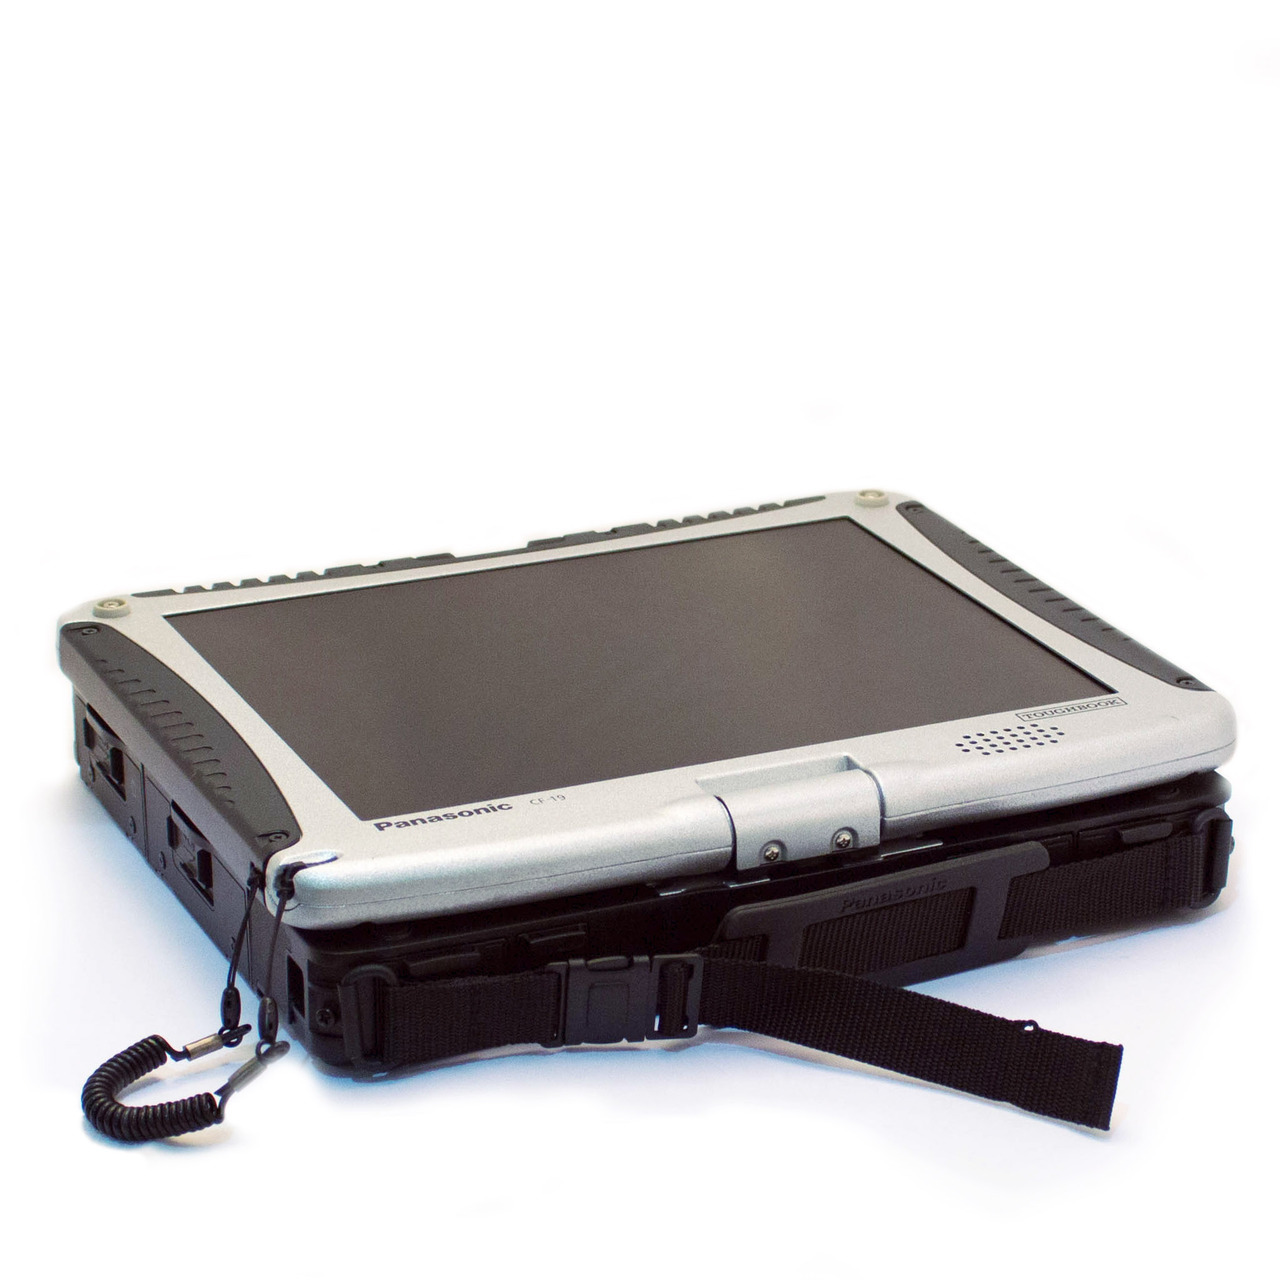 "Laptop Panasonic Toughbook CF-19 MK3, Intel Core 2 Duo SU9300 1.2 GHz, WI-FI, Bluetooth, Display 10,4"" 1024 by 768 Touchscreen, 2 GB DDR2, 250 GB SSD SATA, Second Hand - imaginea 5"